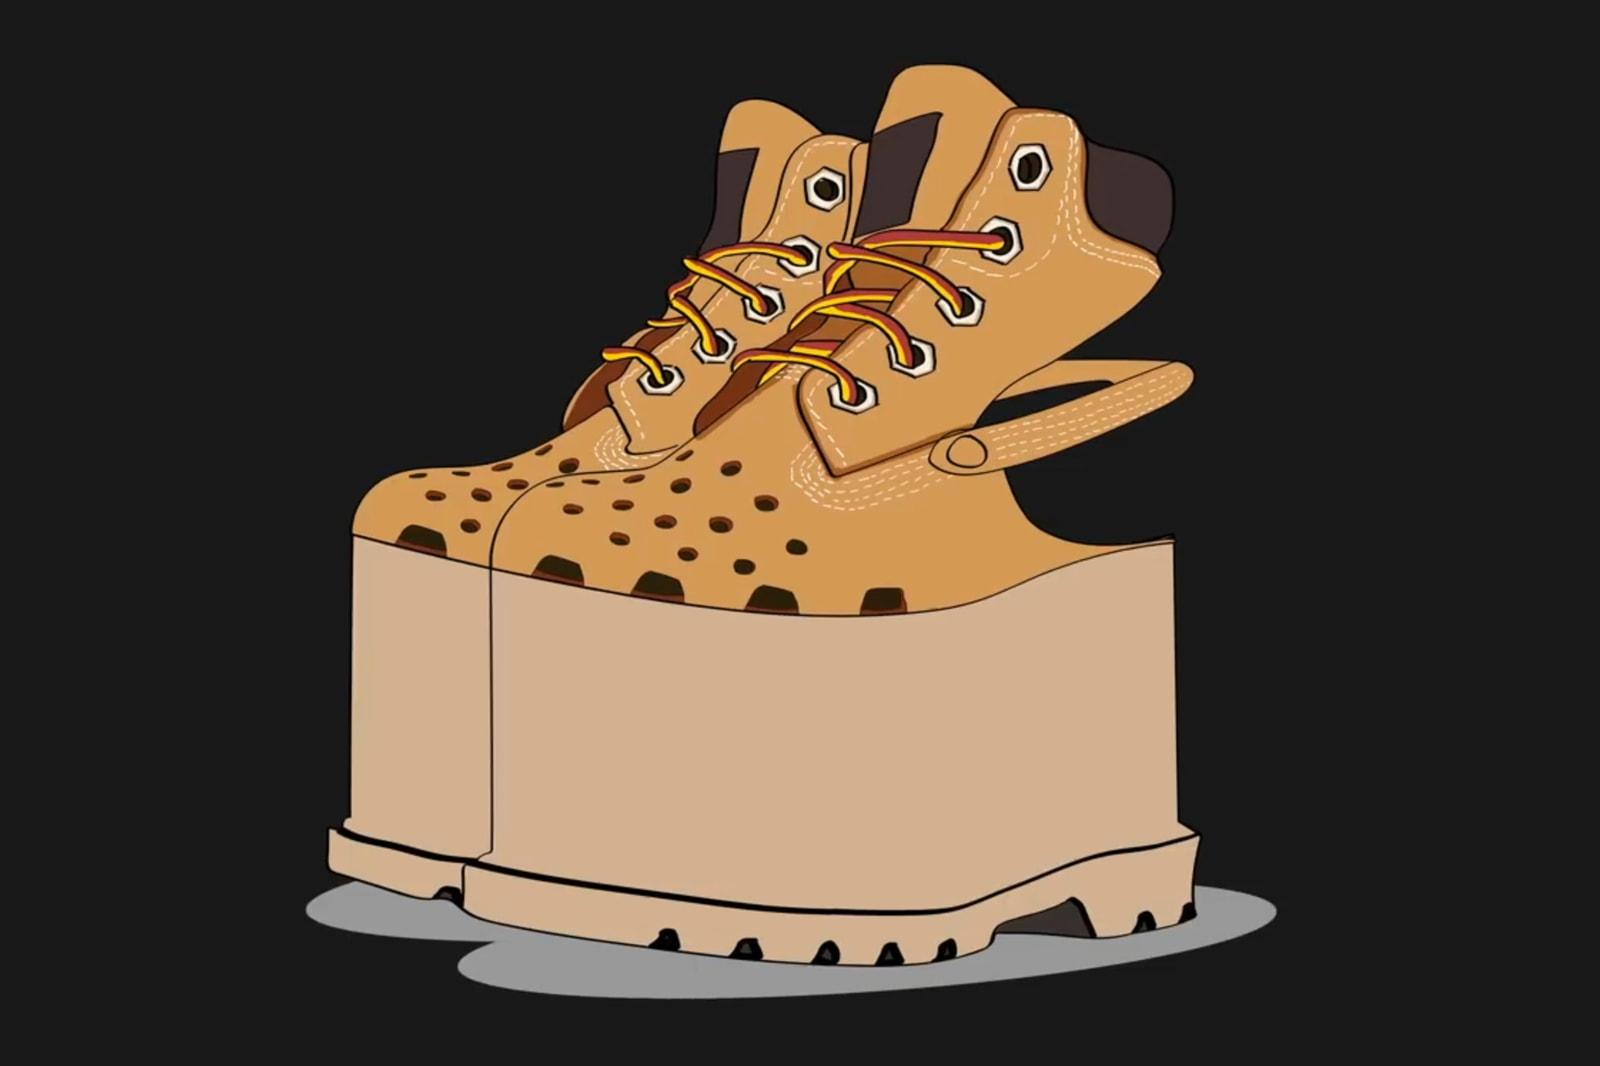 Brian 作客最新一期《Sneaker Shopping》分享購買「假鞋」經歷